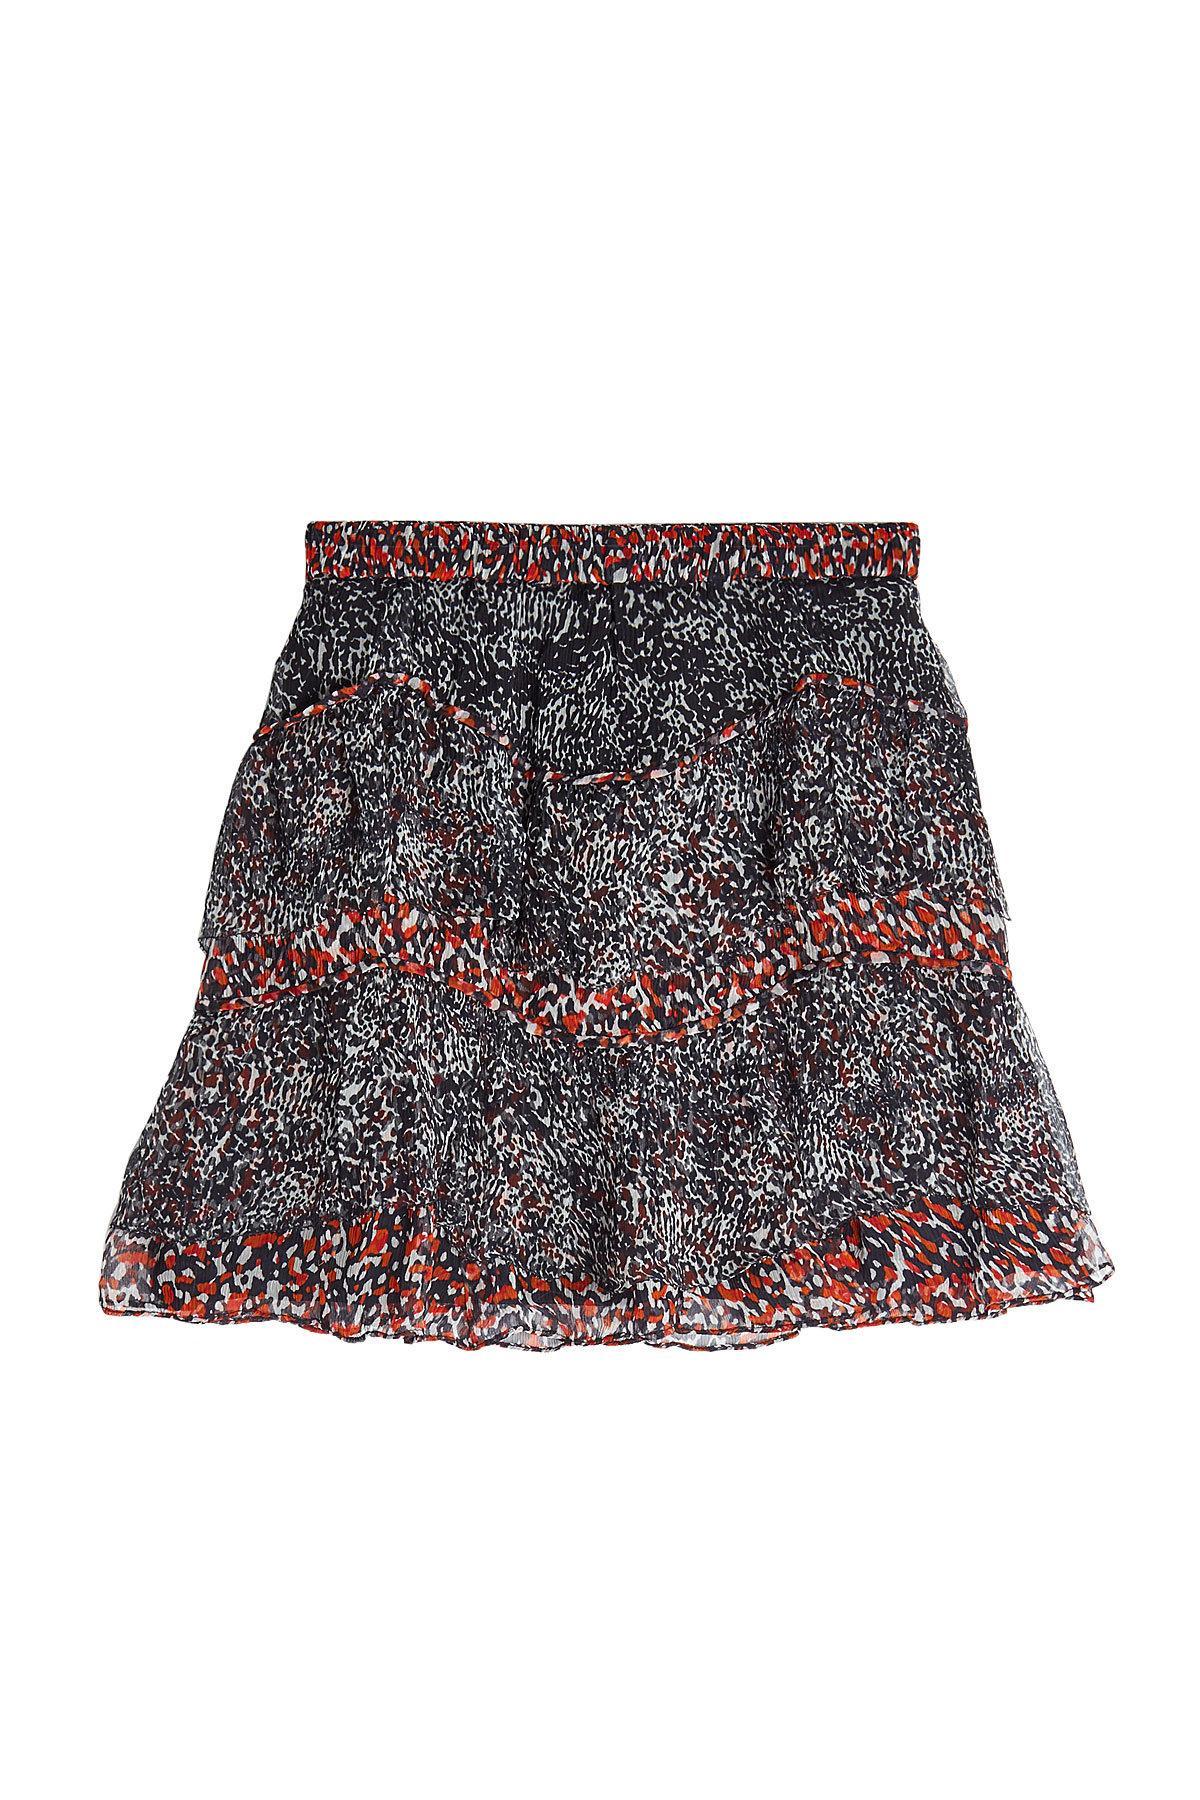 Iro Printed Skirt In Animal Print